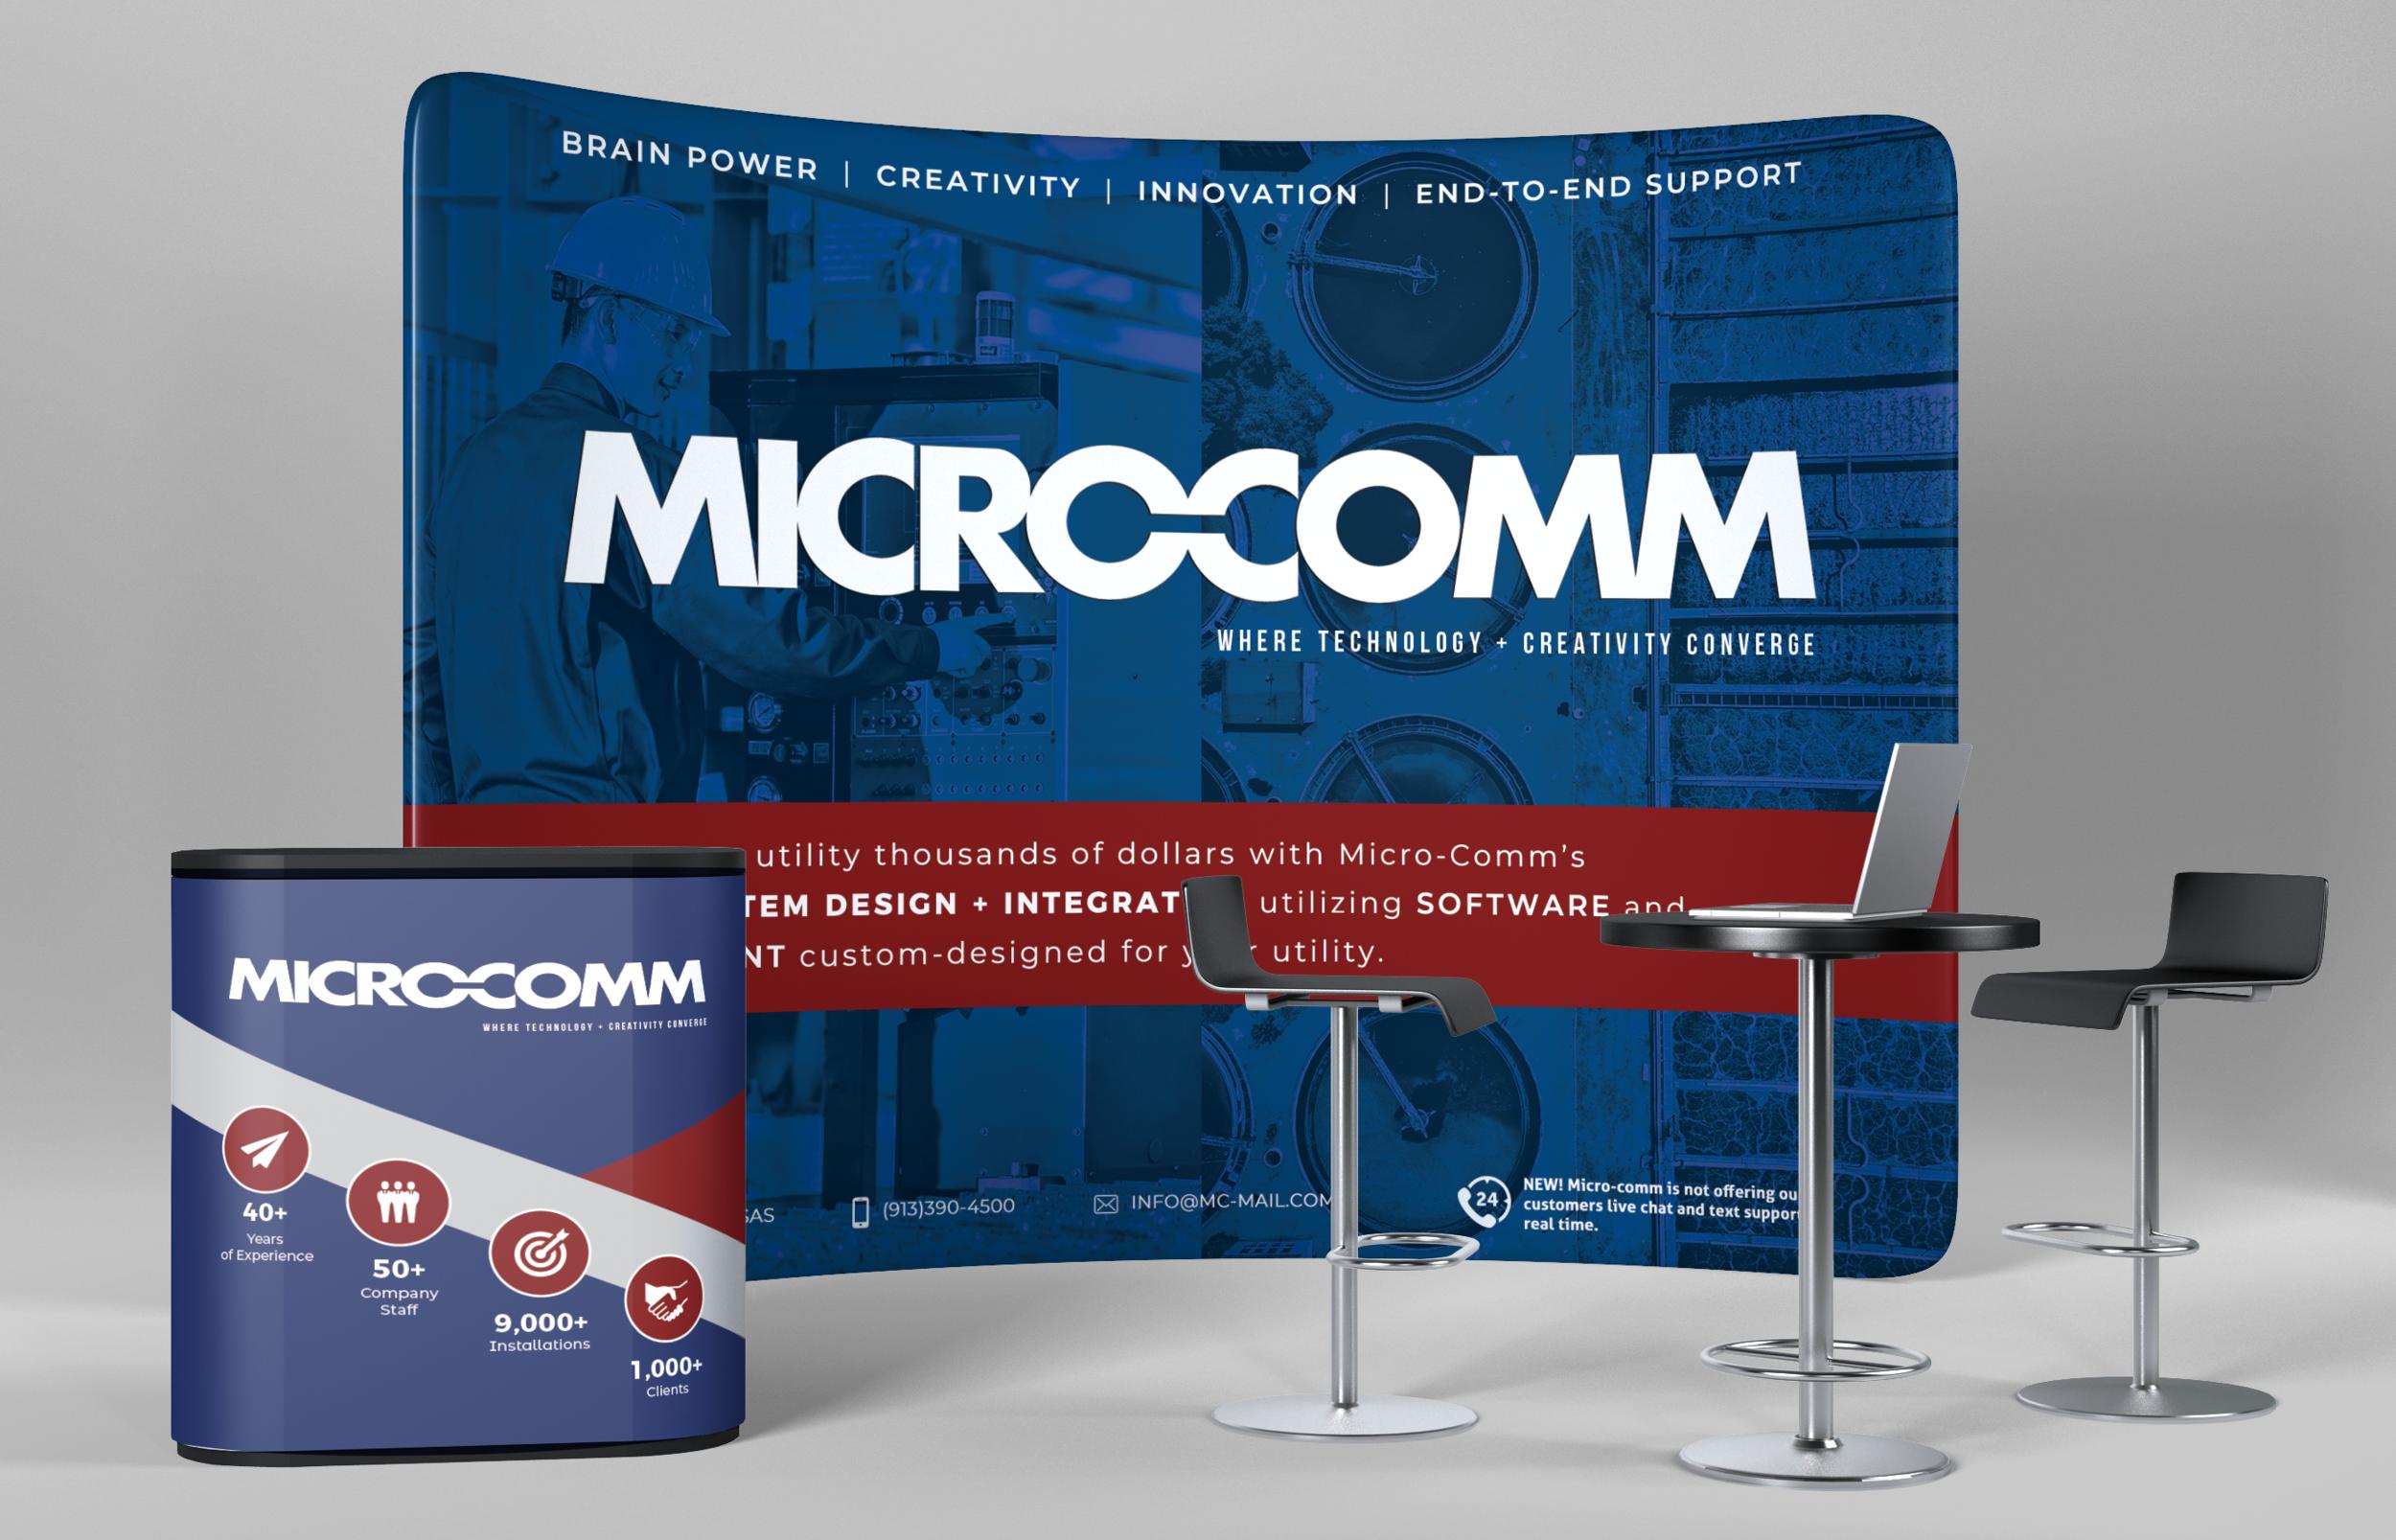 V.3 Microcomm 1panel_table_chairs mockup.png